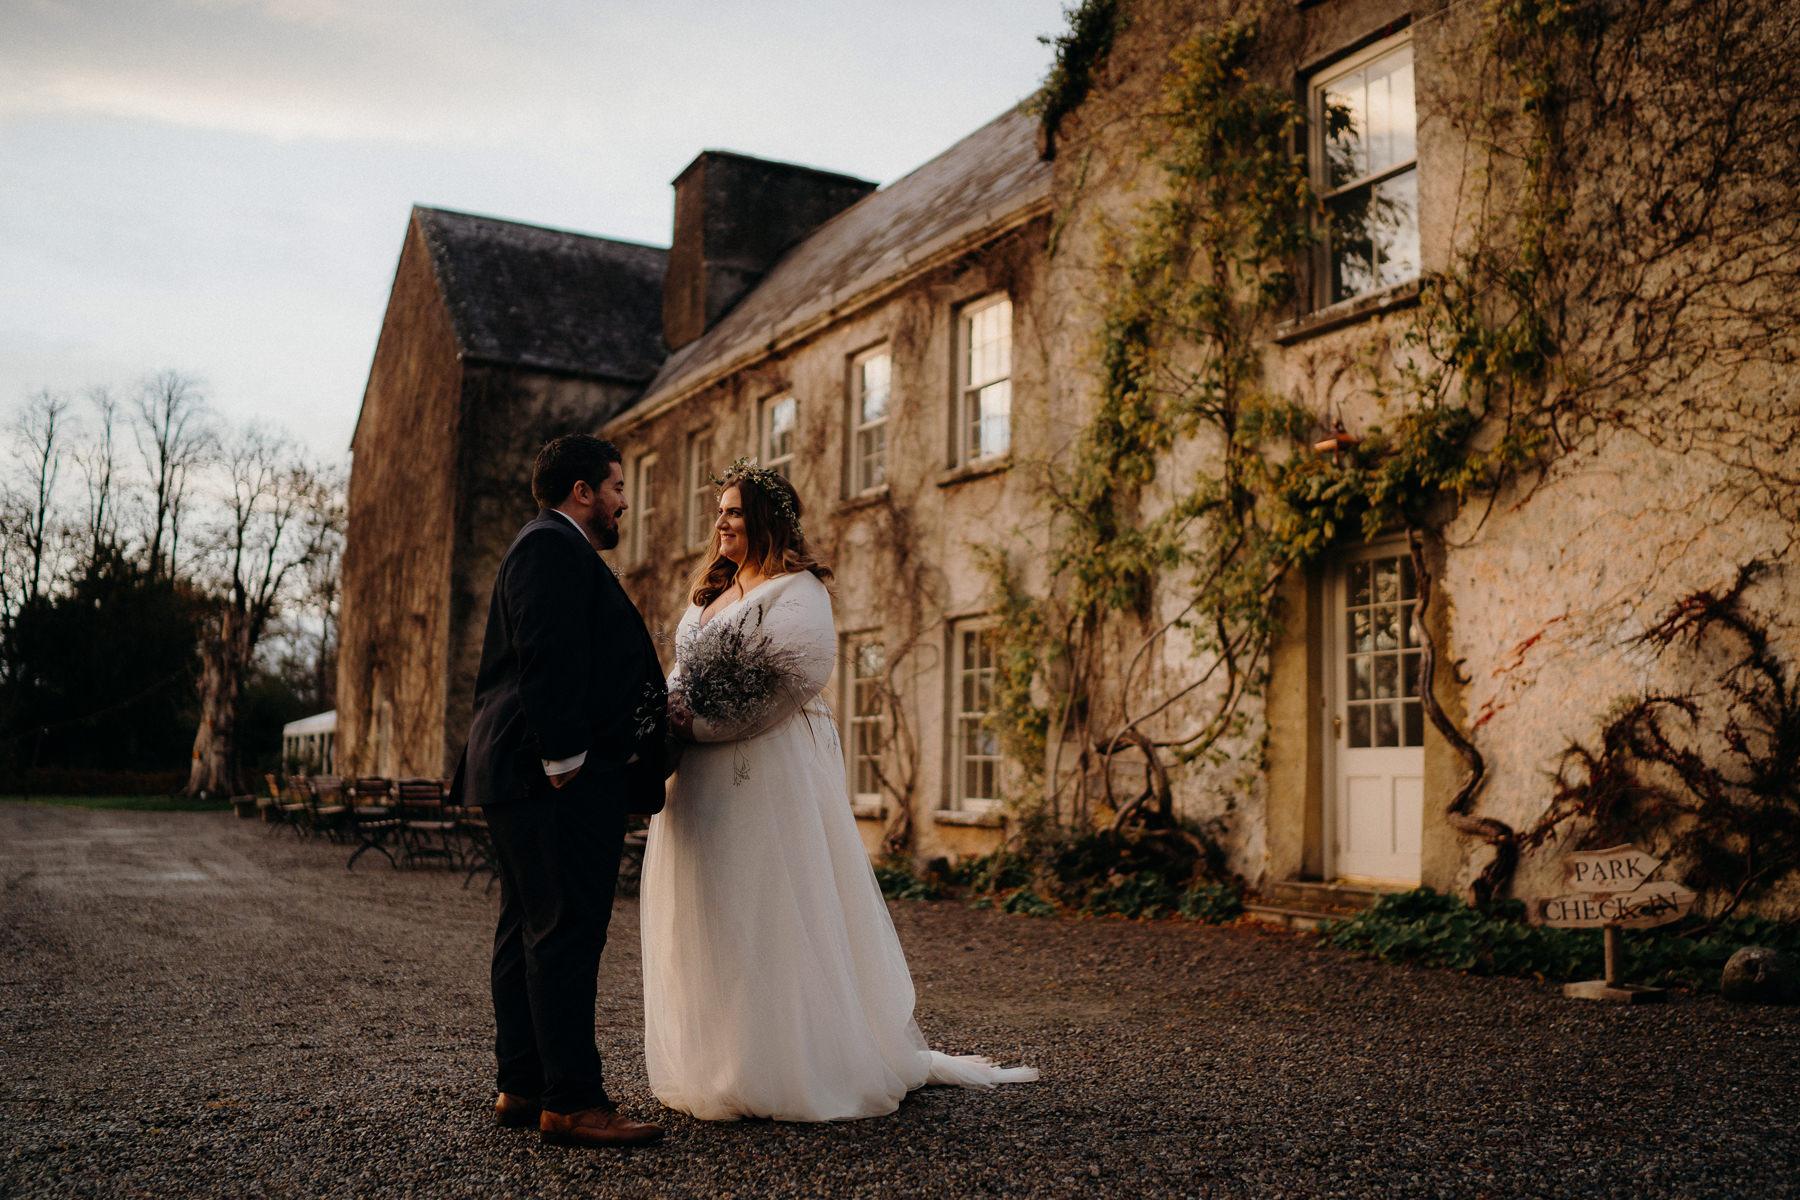 wedding-venue-tipperary-ireland-igstudio